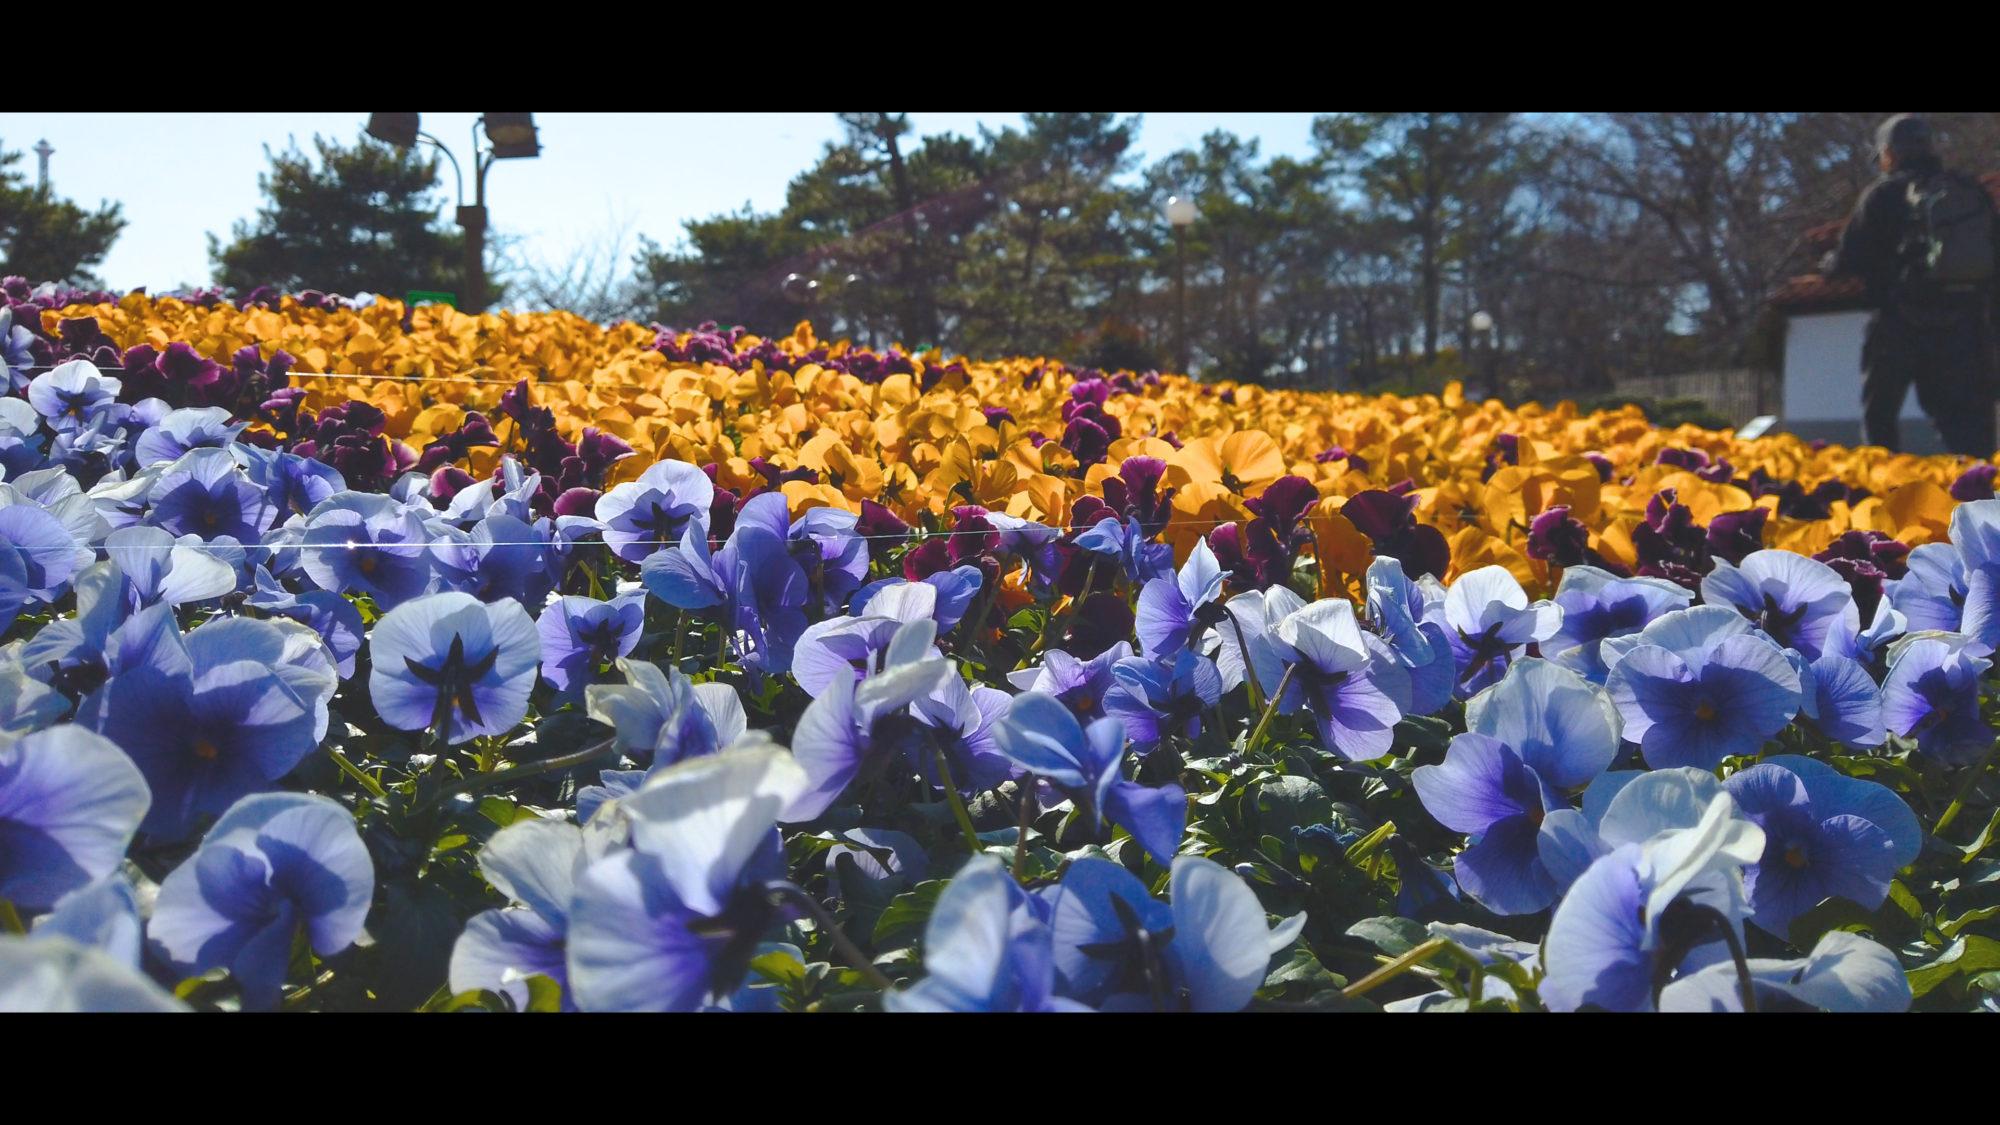 d32b3ddcdf3d1dba7d57ee2bff66e485-e1581433558513 大阪府 鶴見緑地公園(梅や河津桜に水仙など春の花おすすめの写真スポット。 アクセス情報や交通手段・駐車場情報などまとめ)